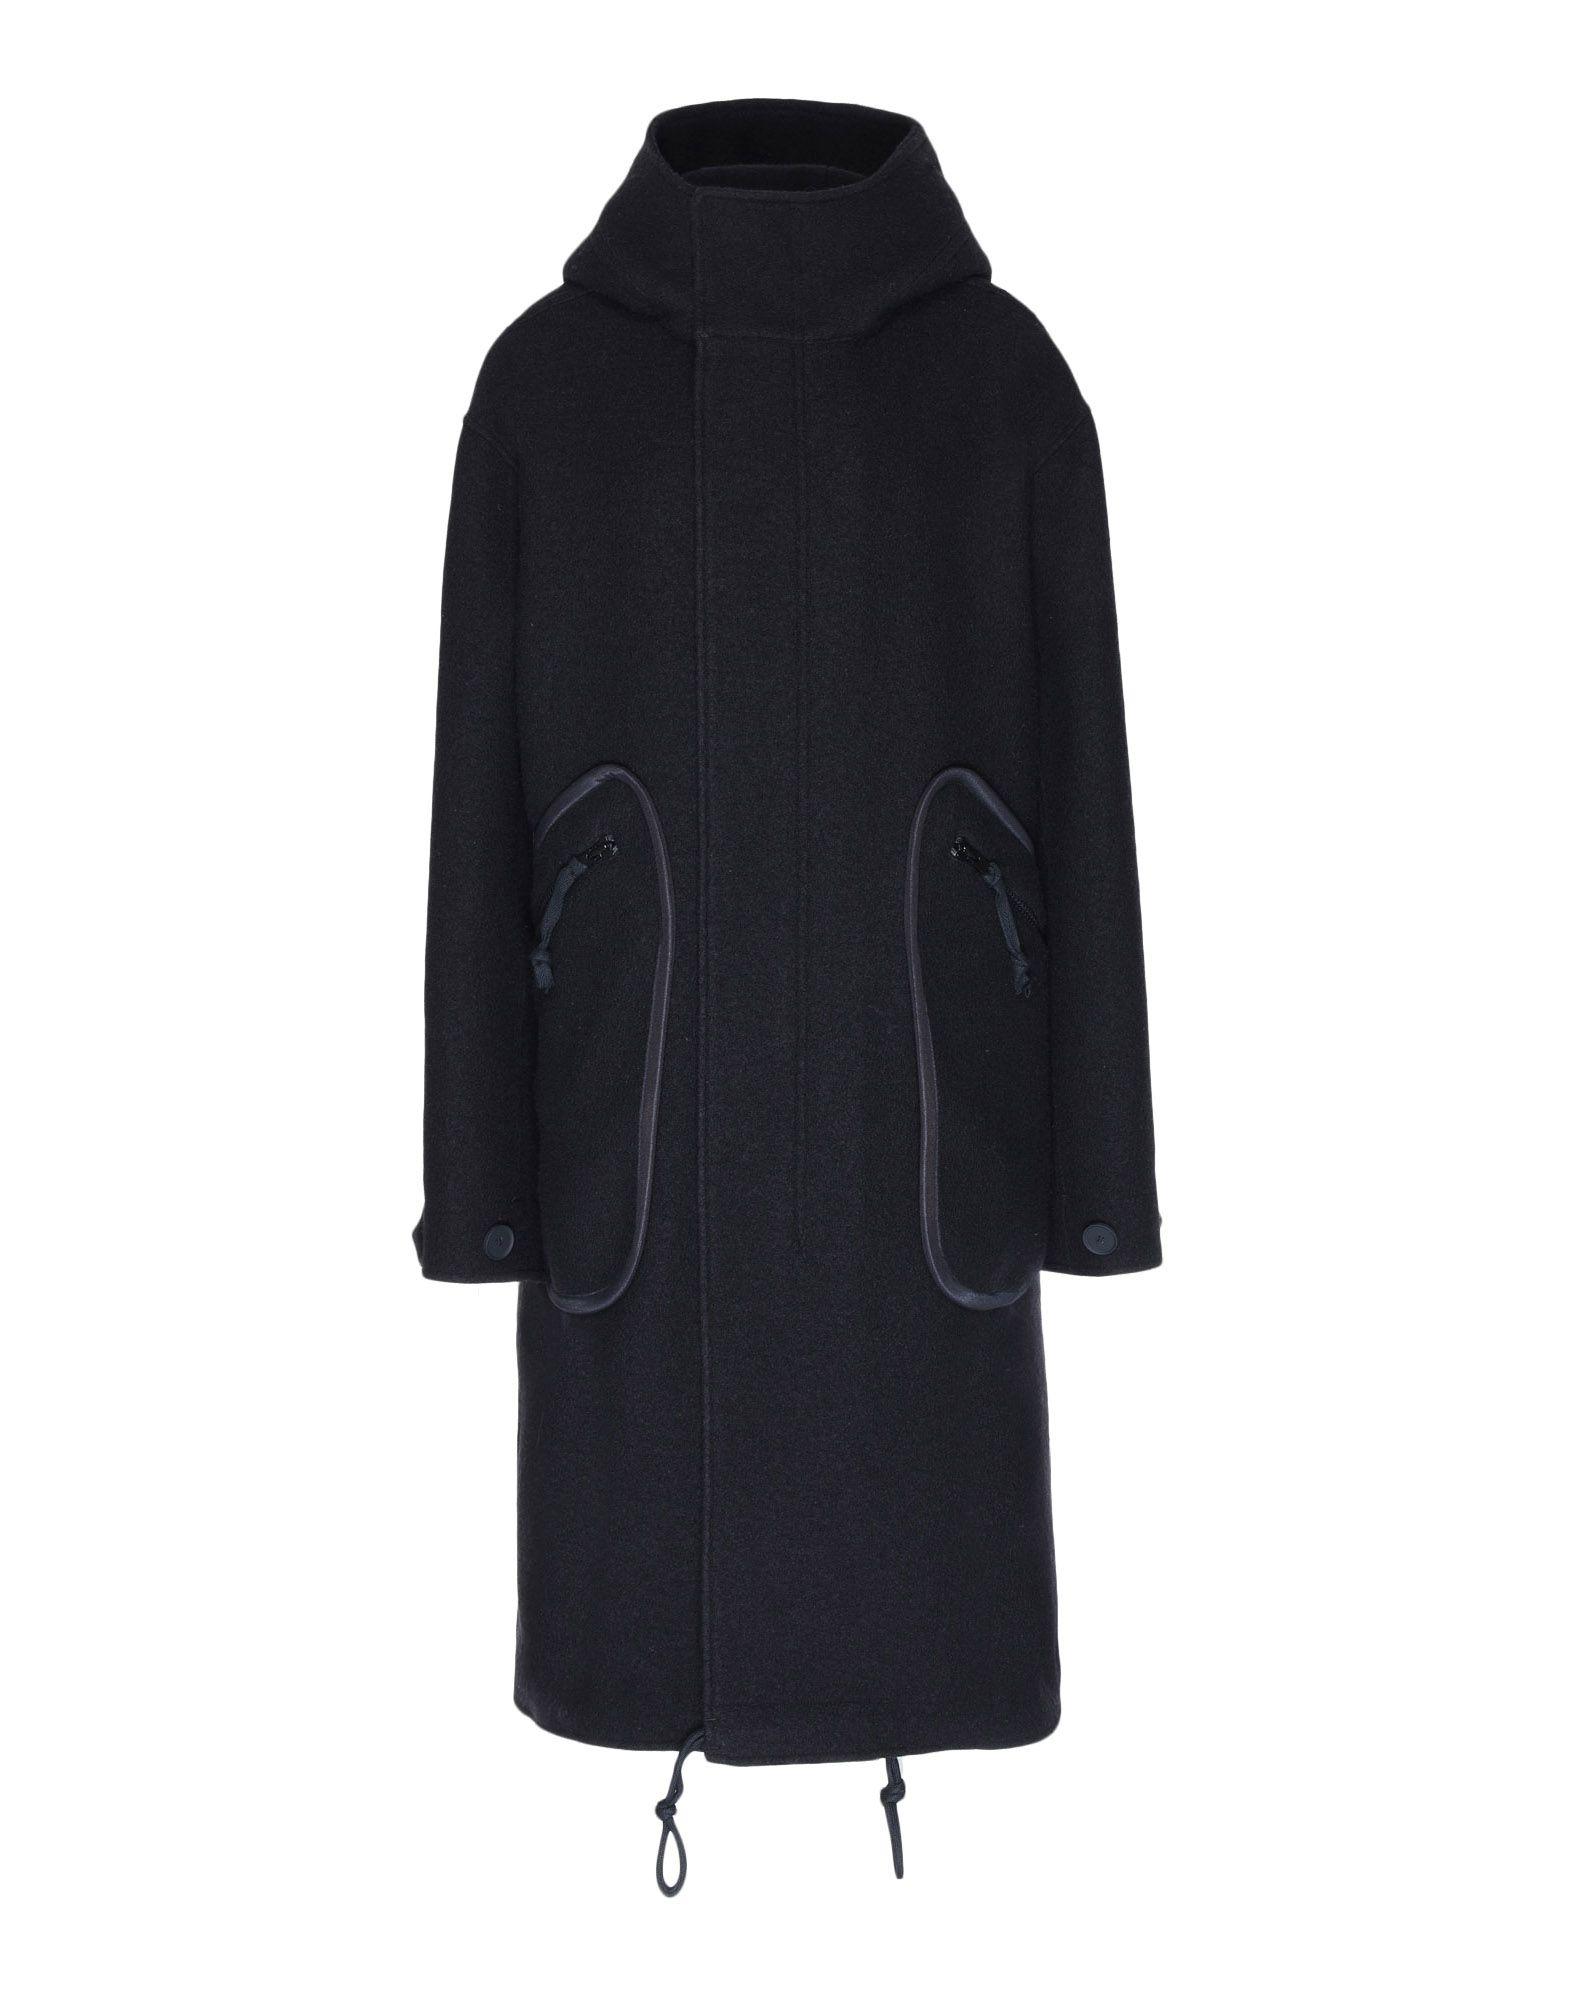 Y-3 Y-3 Reversible Wool Parka Coat Woman f